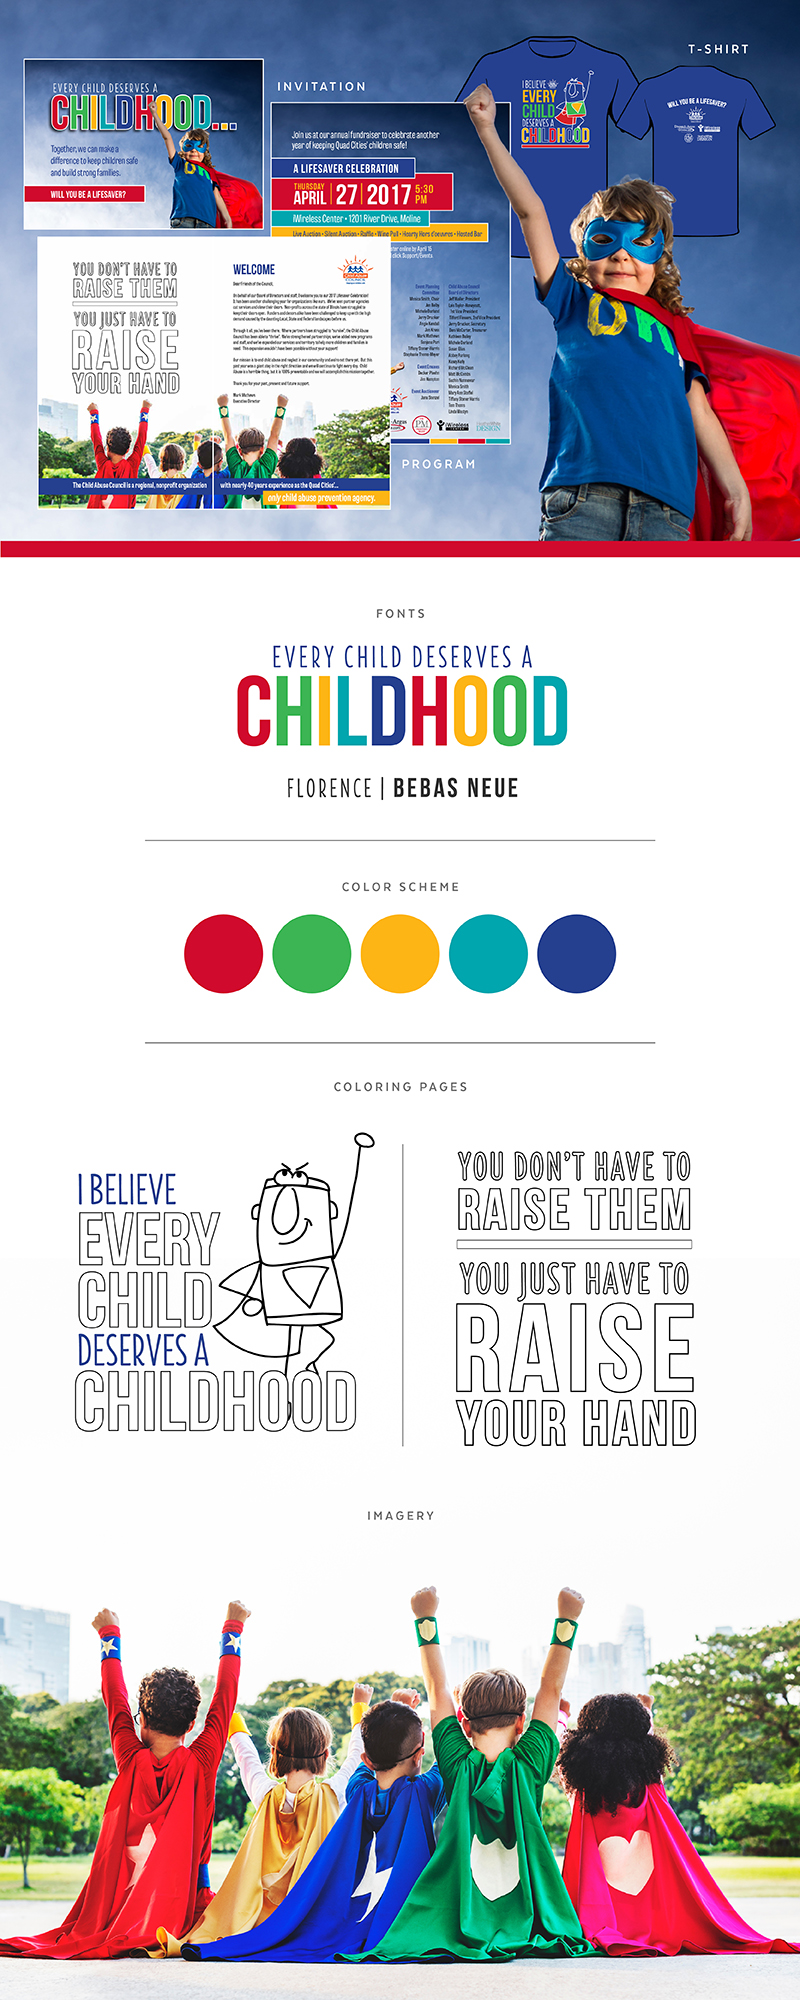 Child Abuse Council 2017 Lifesaver Celebration